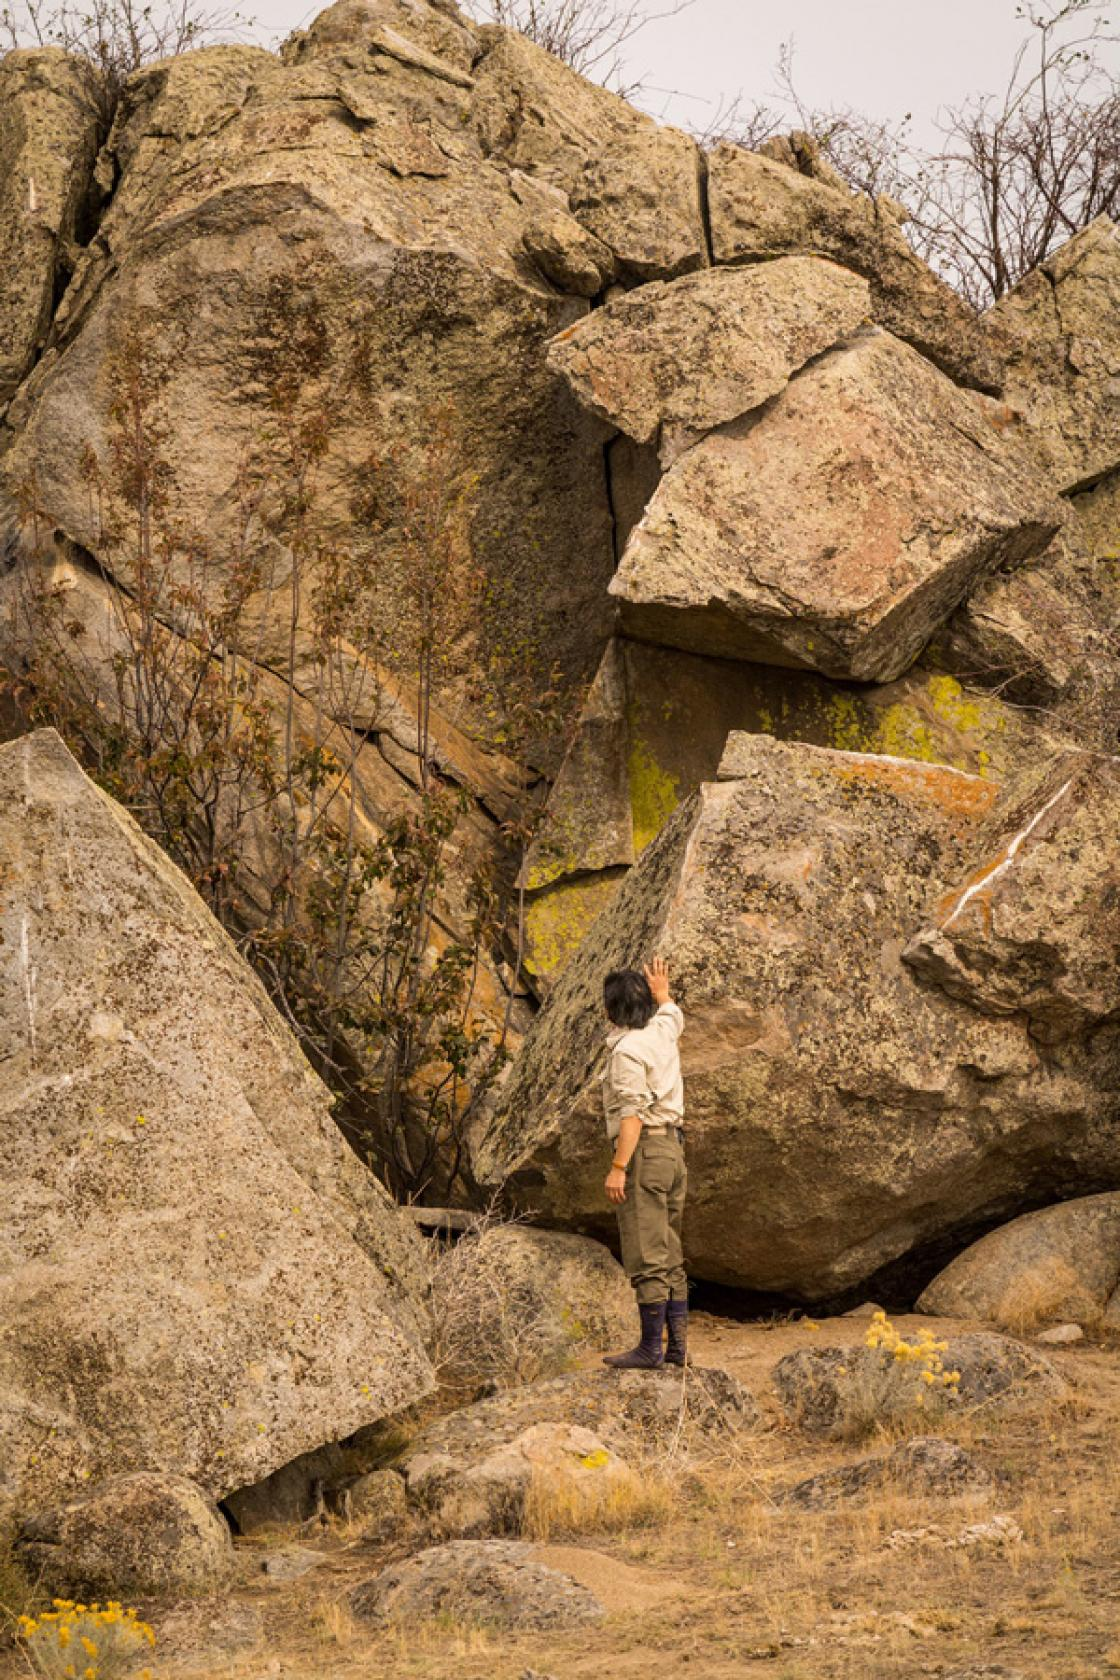 Photograph of Sadafumi Uchiyama Rock Hunting.